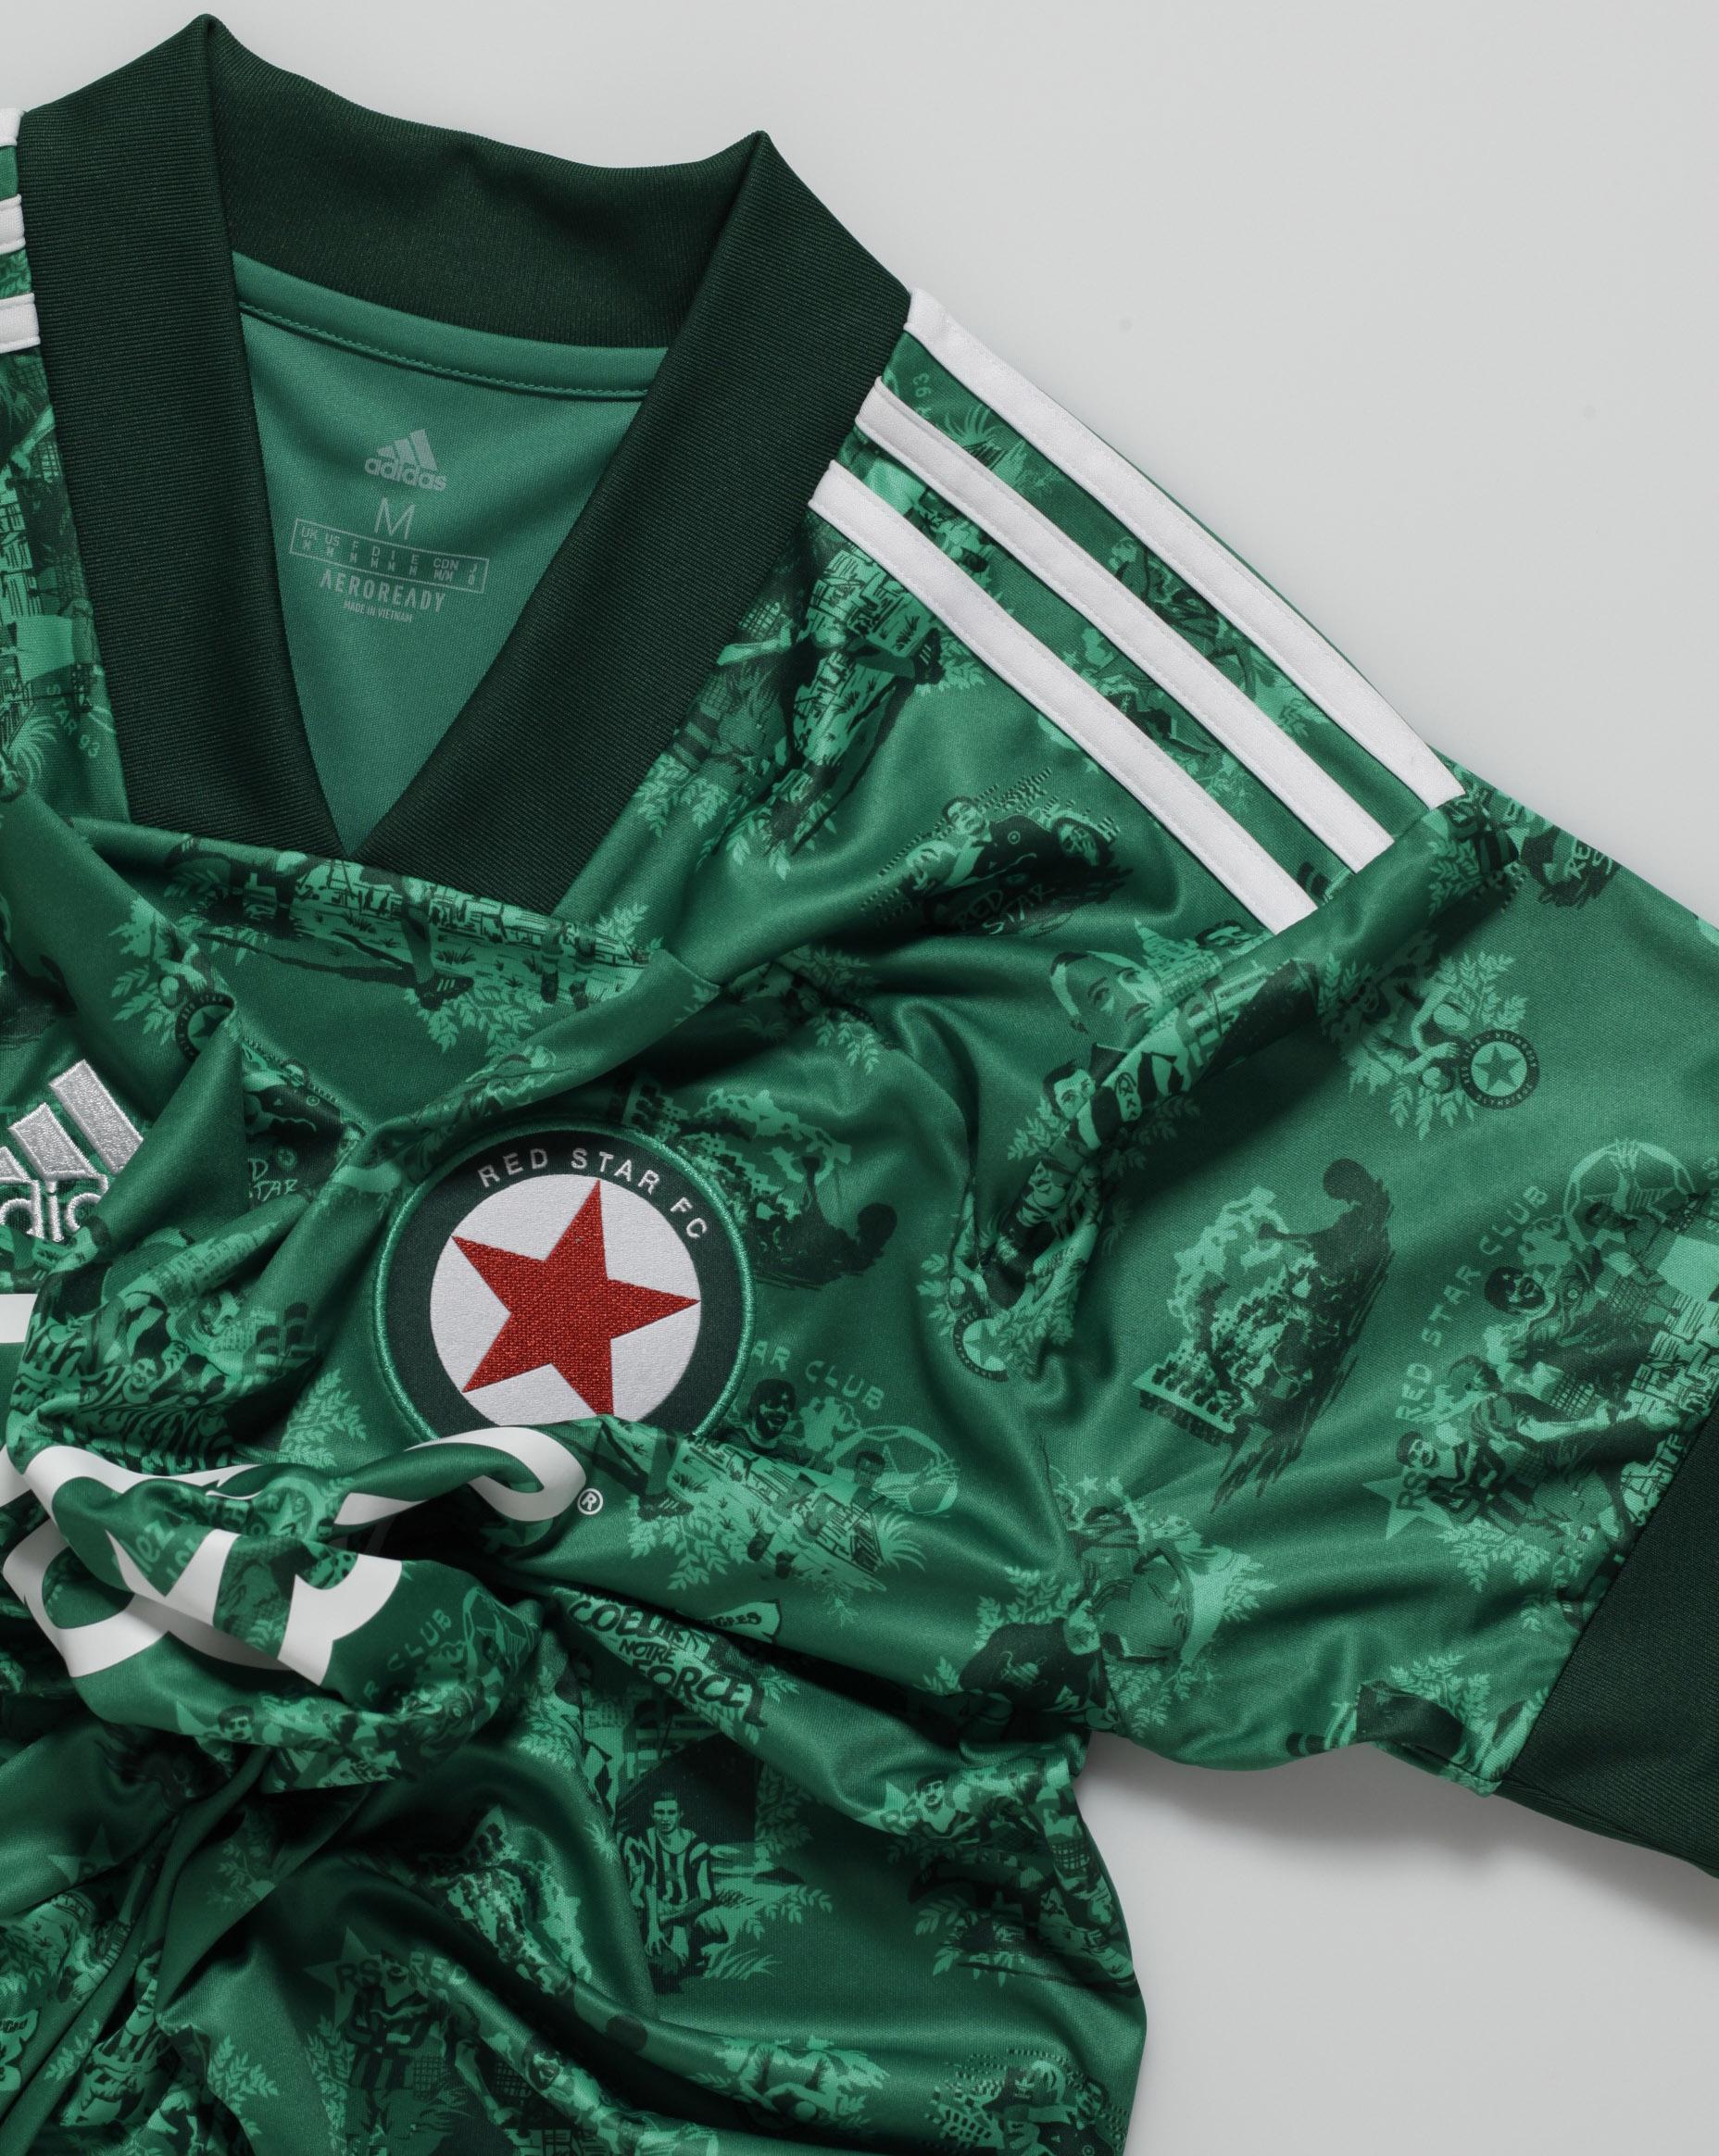 Camisas do Red Star FC 2020-2021 Adidas Titular